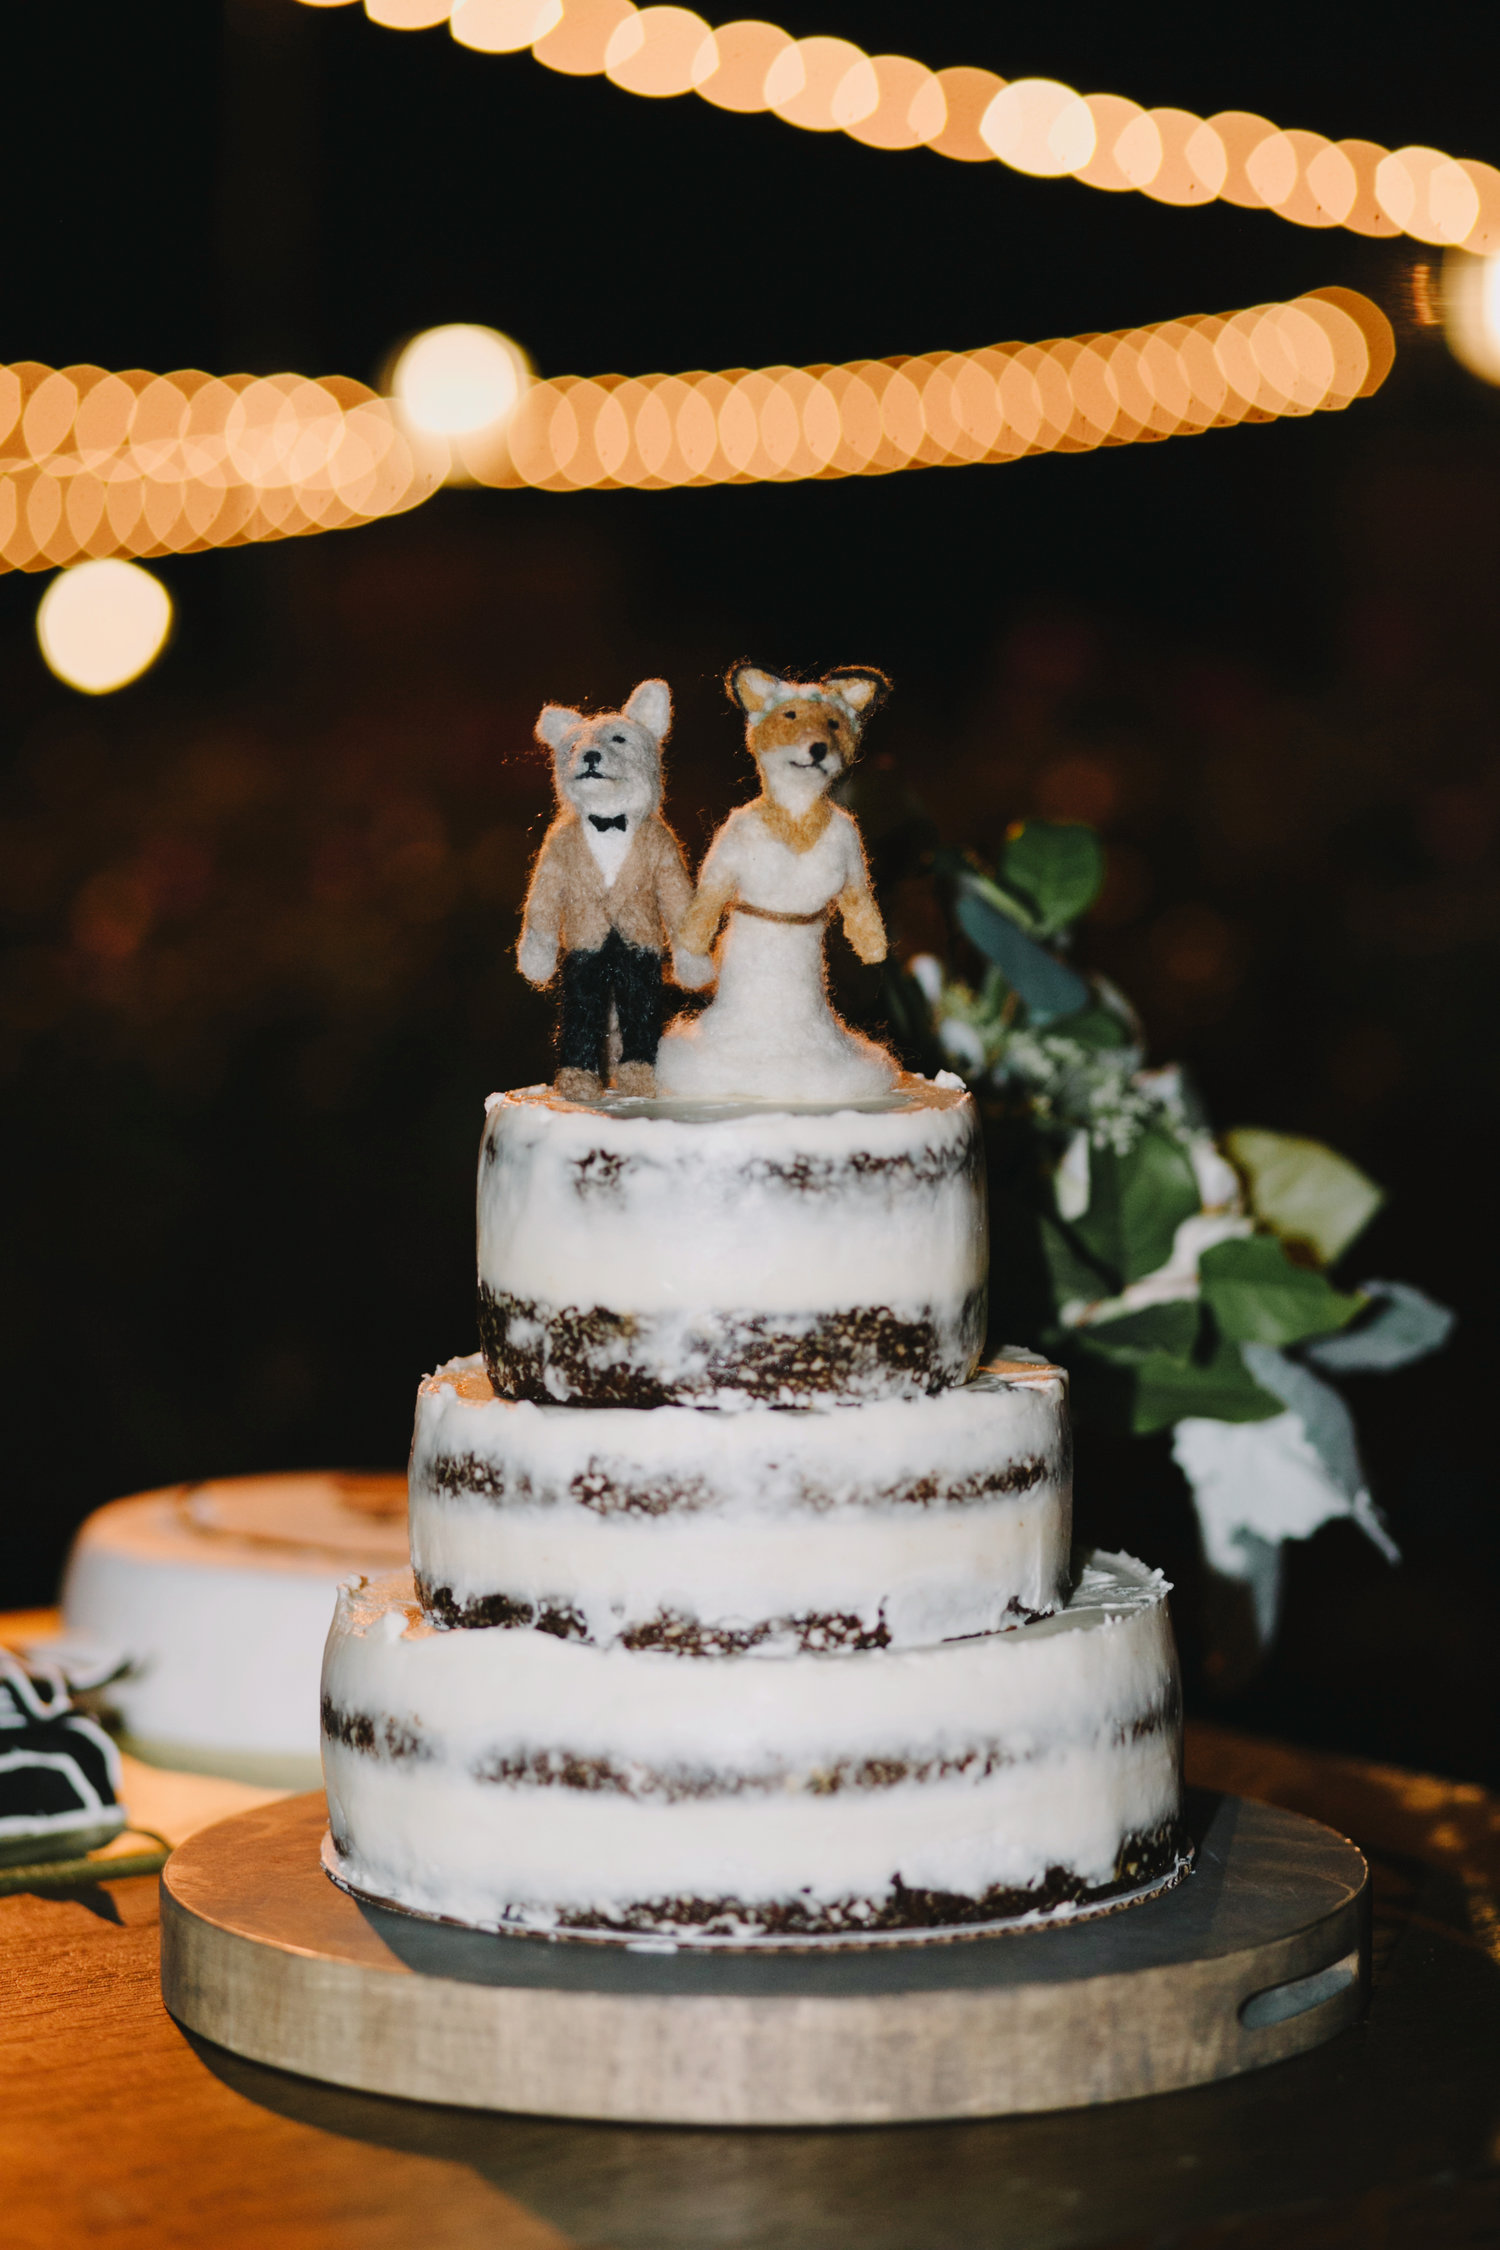 Healthy Body Bakery - Healthy Wedding Cakes